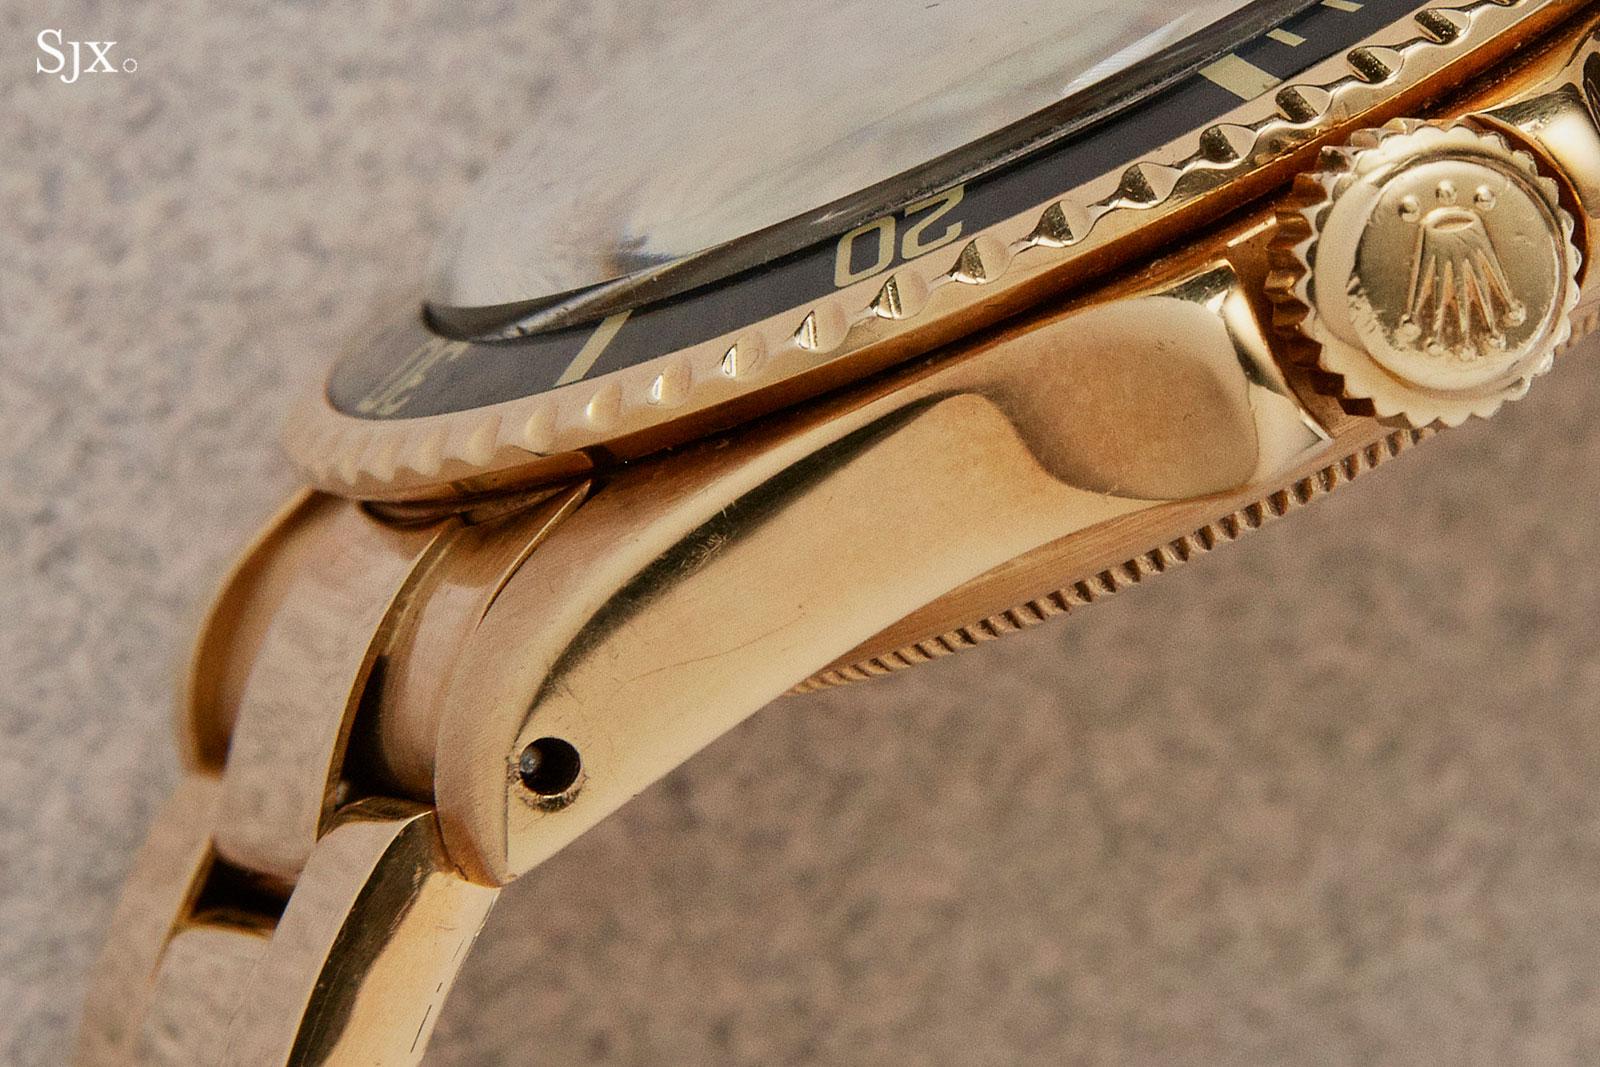 Rolex Submariner gold 1680 red khanjar 4